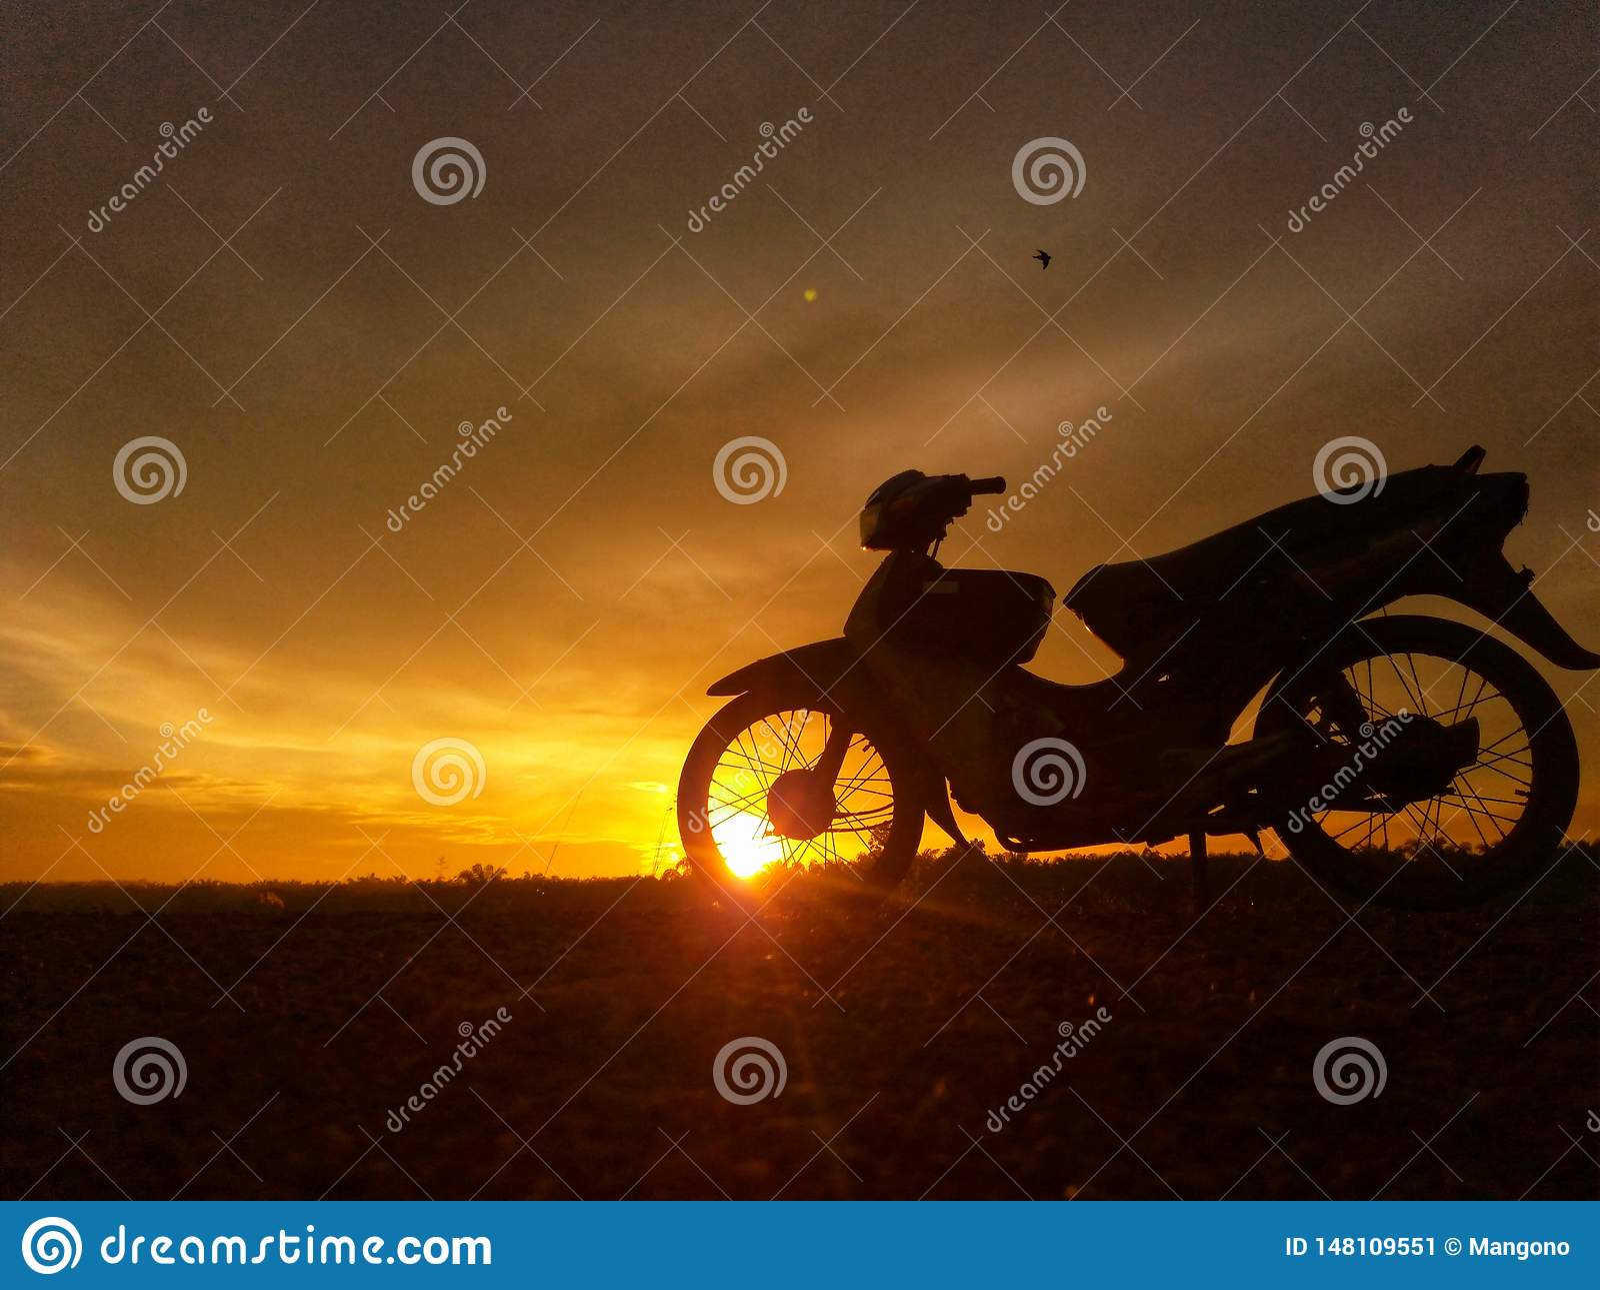 Motocycle in zonsopgang